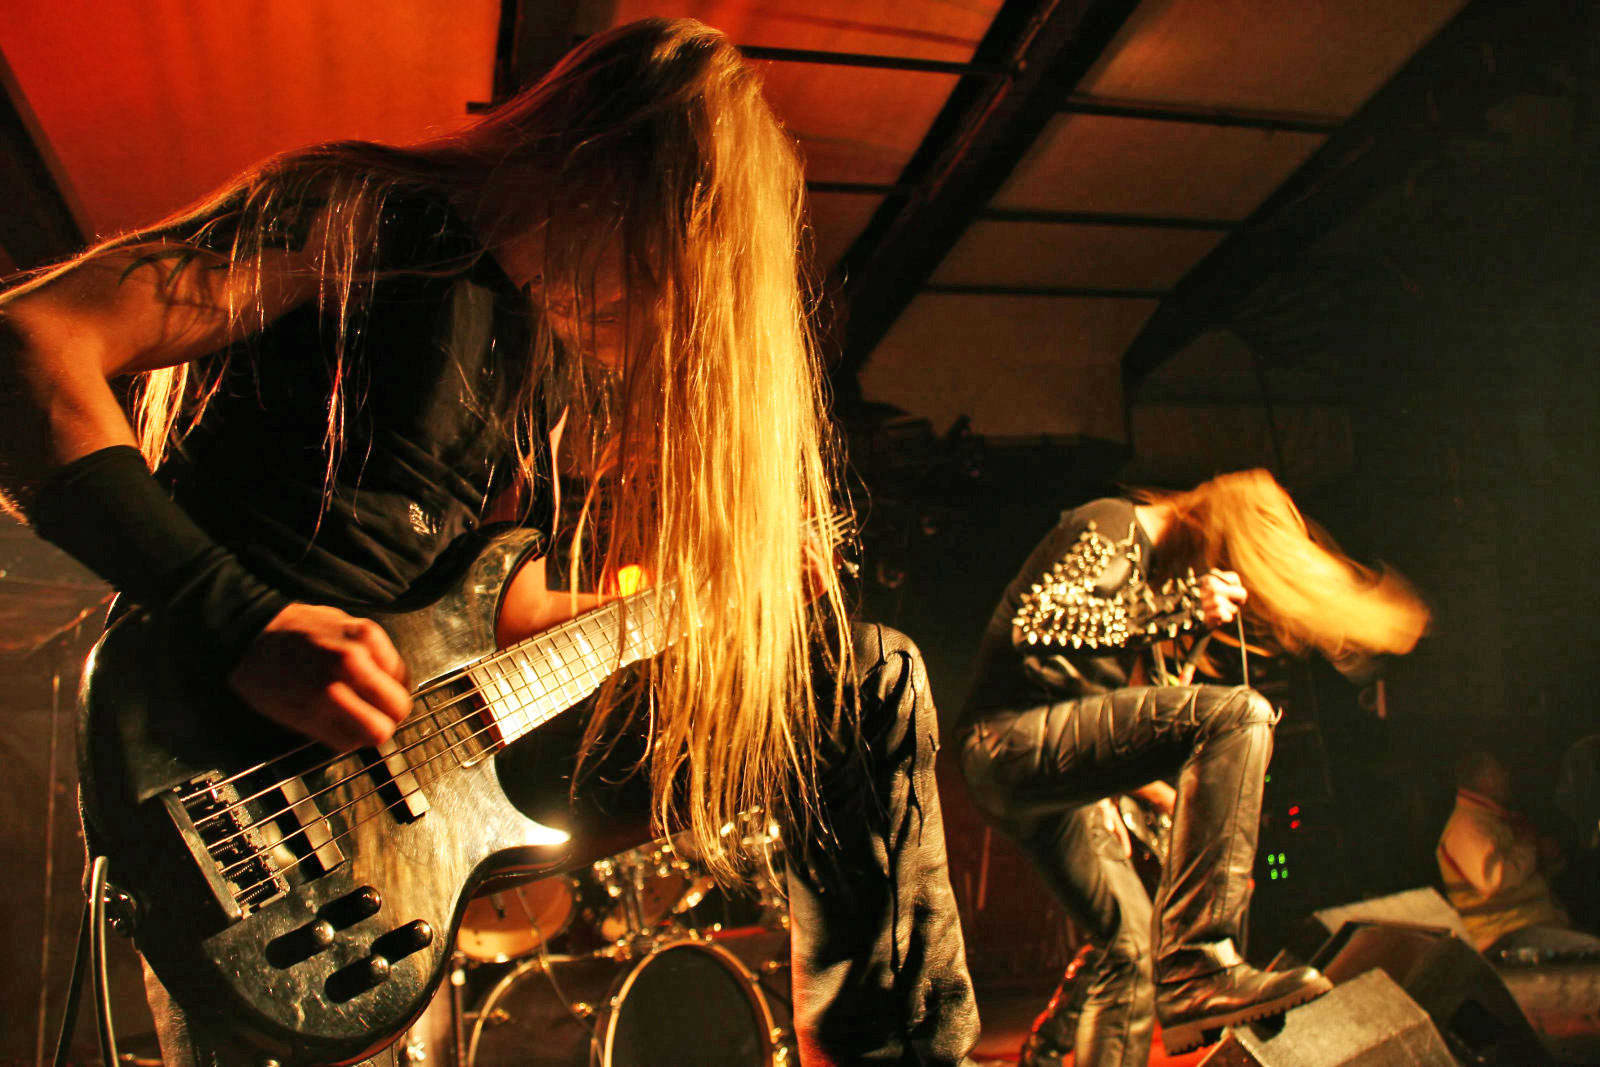 AI generates non-stop stream of death metal